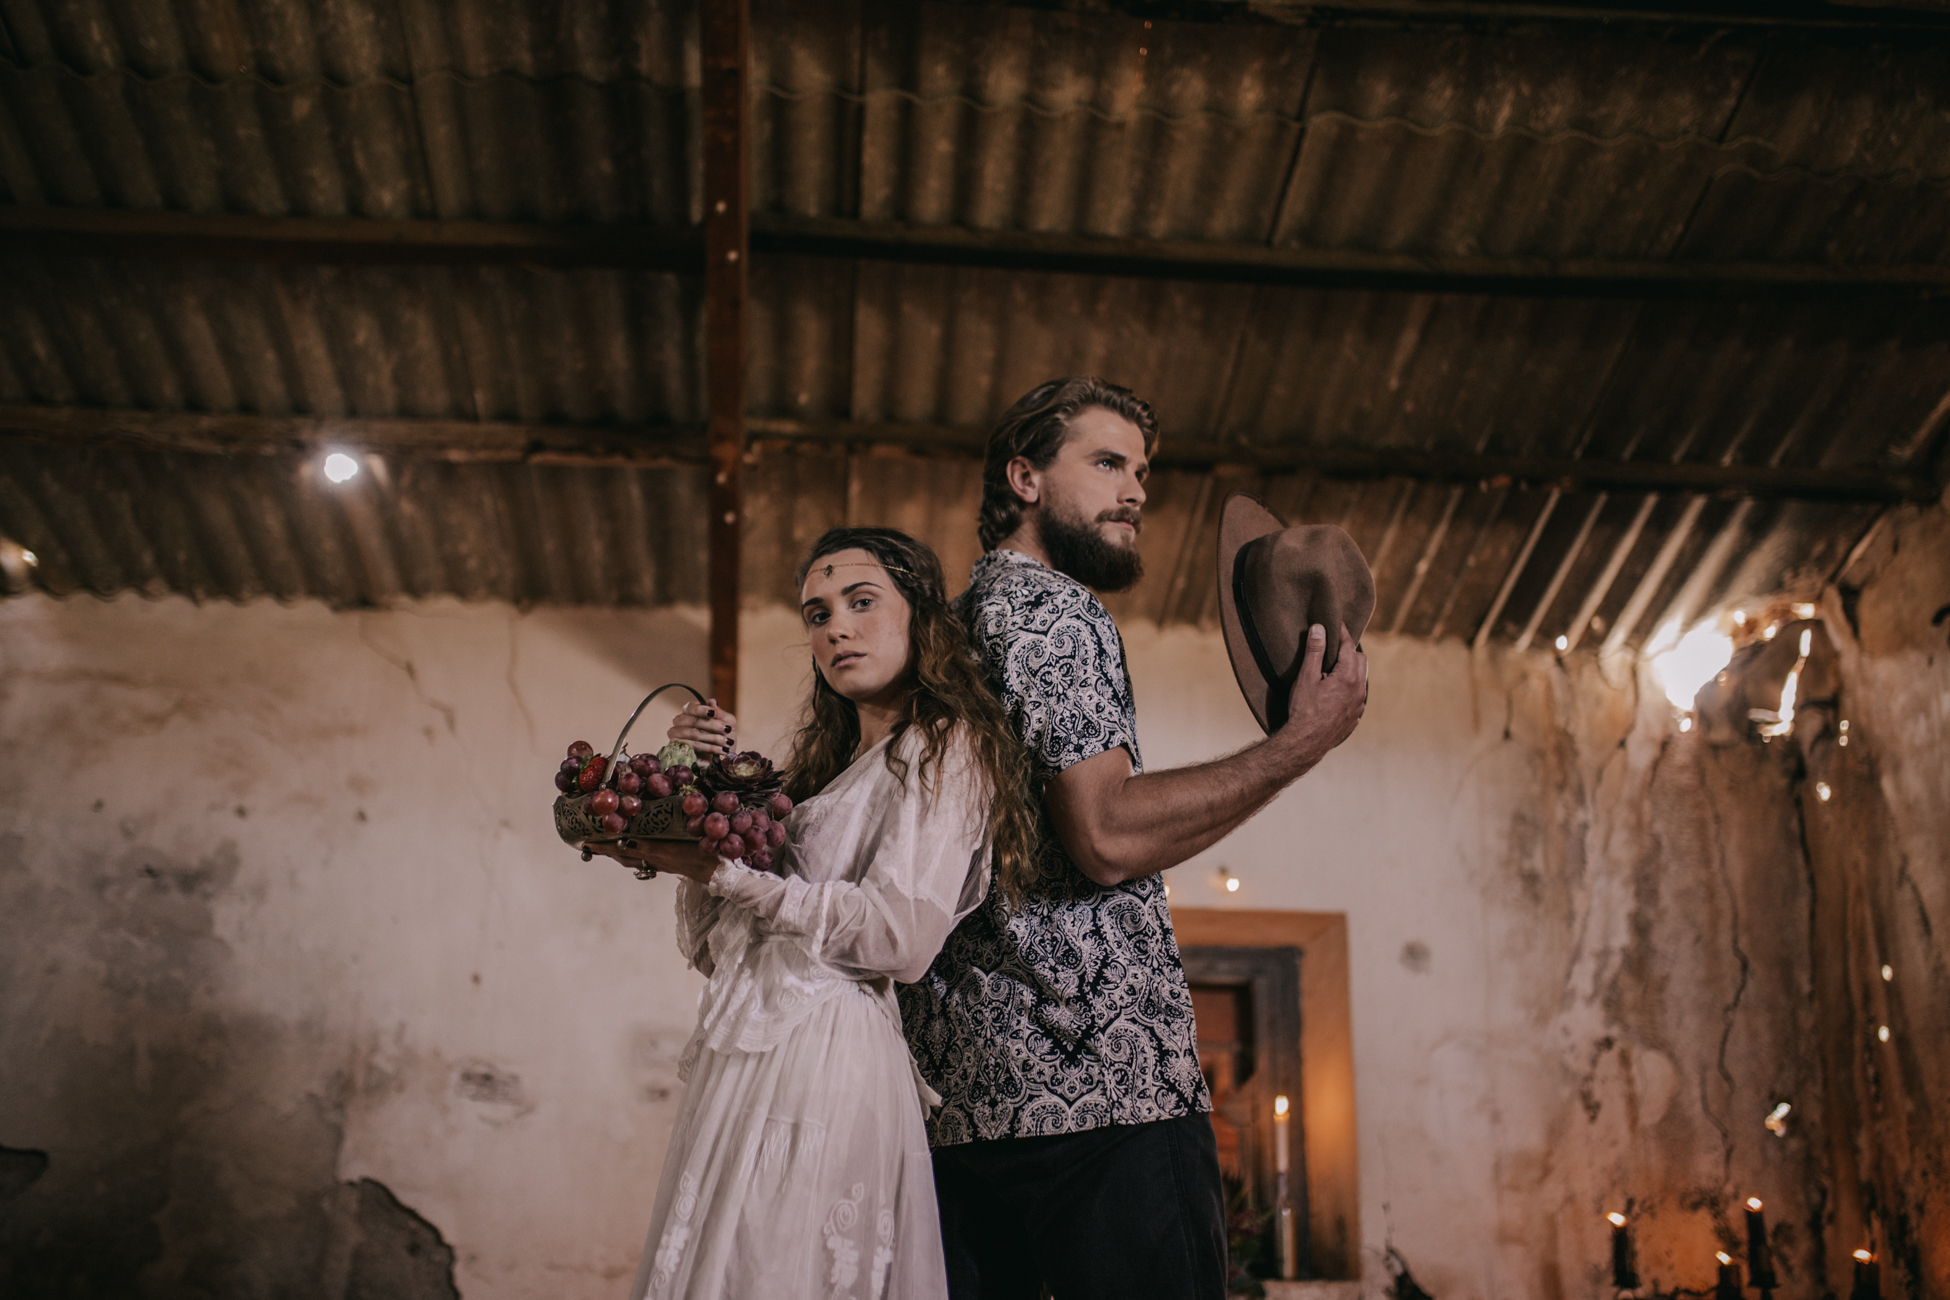 thenortherngirlphotography_photography_thenortherngirl_rebeccascabros_wedding_weddingphotography_weddingphotographer_wood_muebles_deco_bodasdecaramelo_home_bedtime_gaywedding_editorial_desierto_desert_wildestdreams_amortexano-177.jpg